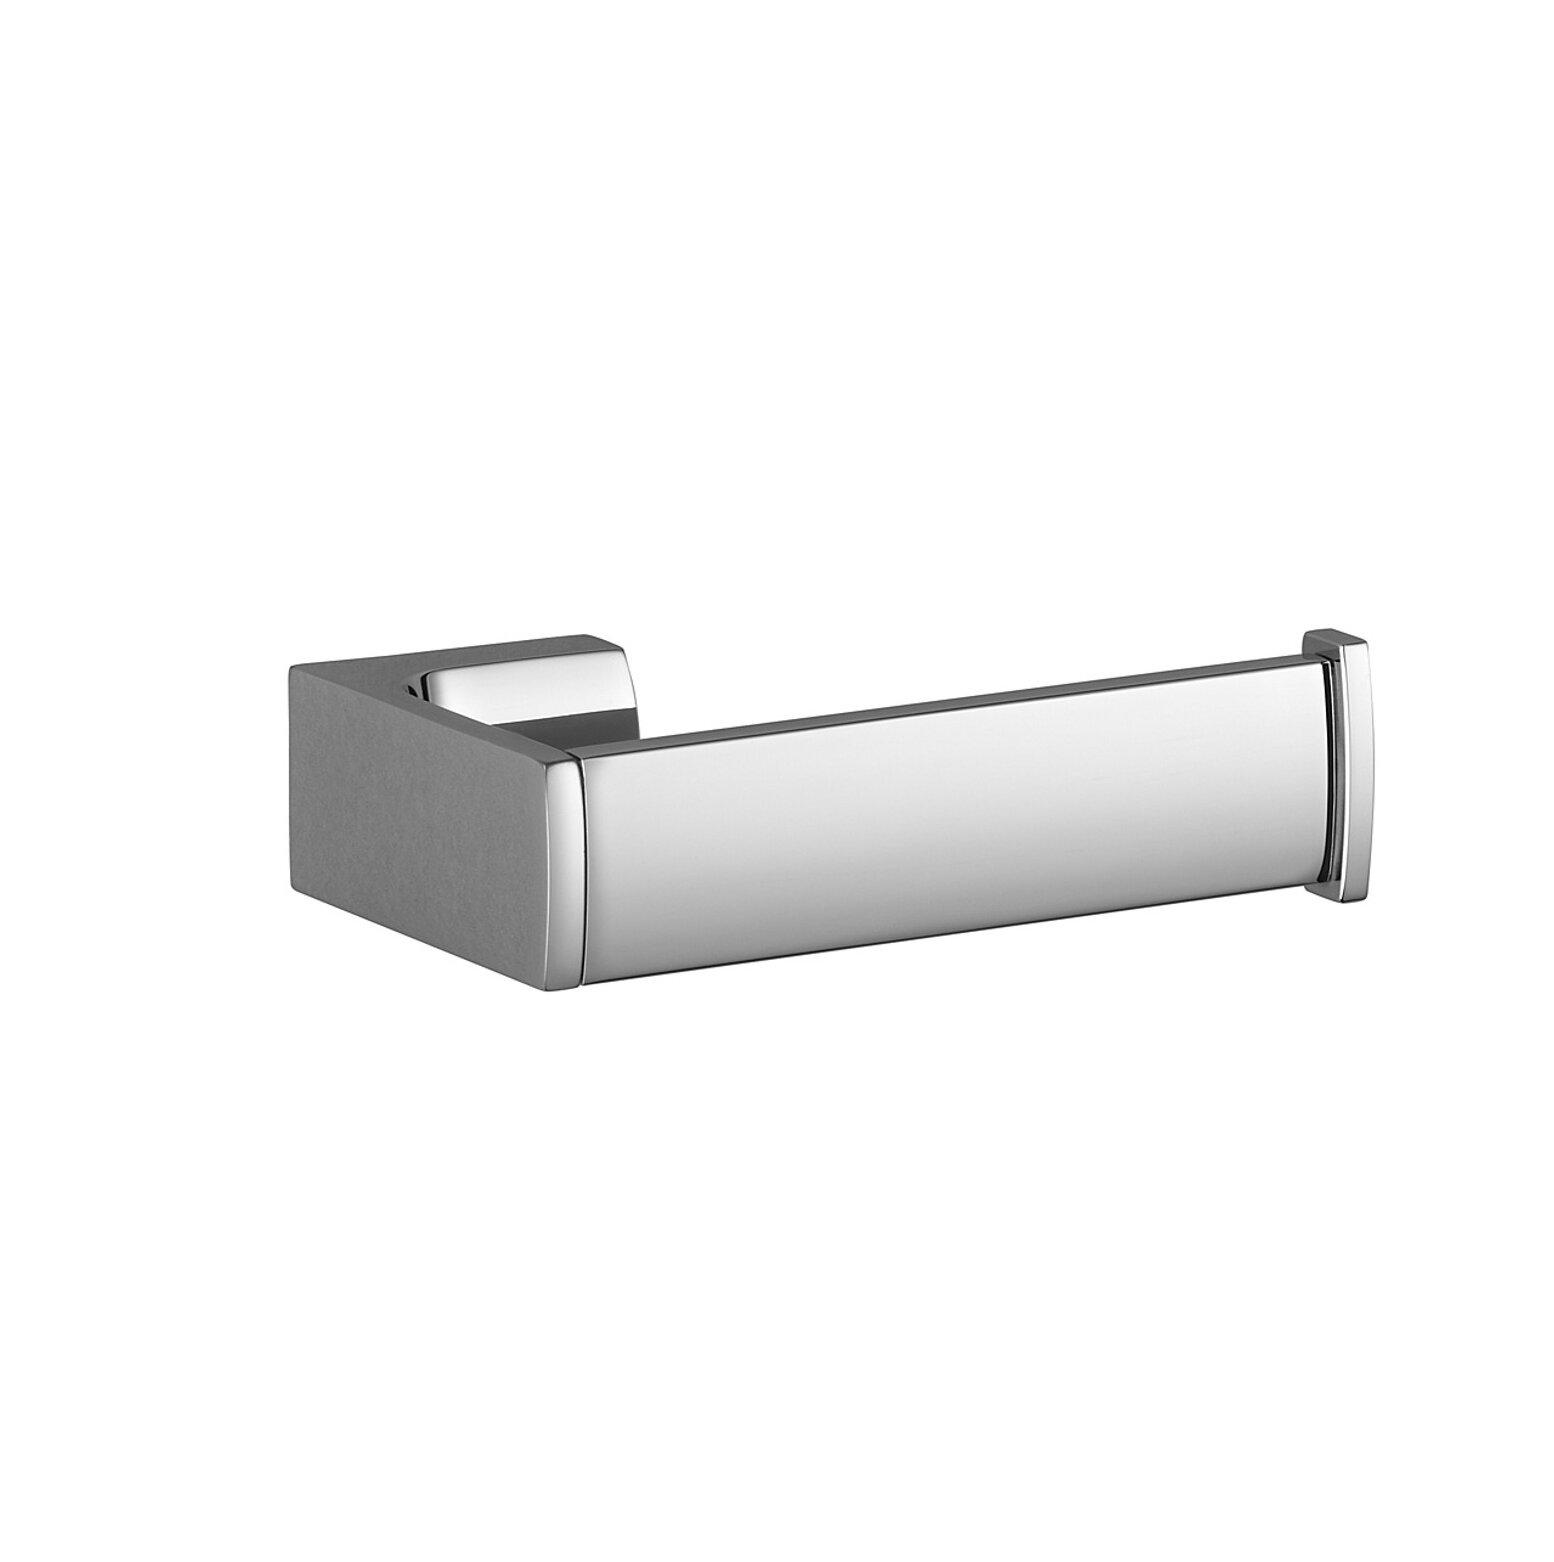 Brilliant Villeroy Boch Bathroom And Wellness Wayfair Co Uk Download Free Architecture Designs Intelgarnamadebymaigaardcom